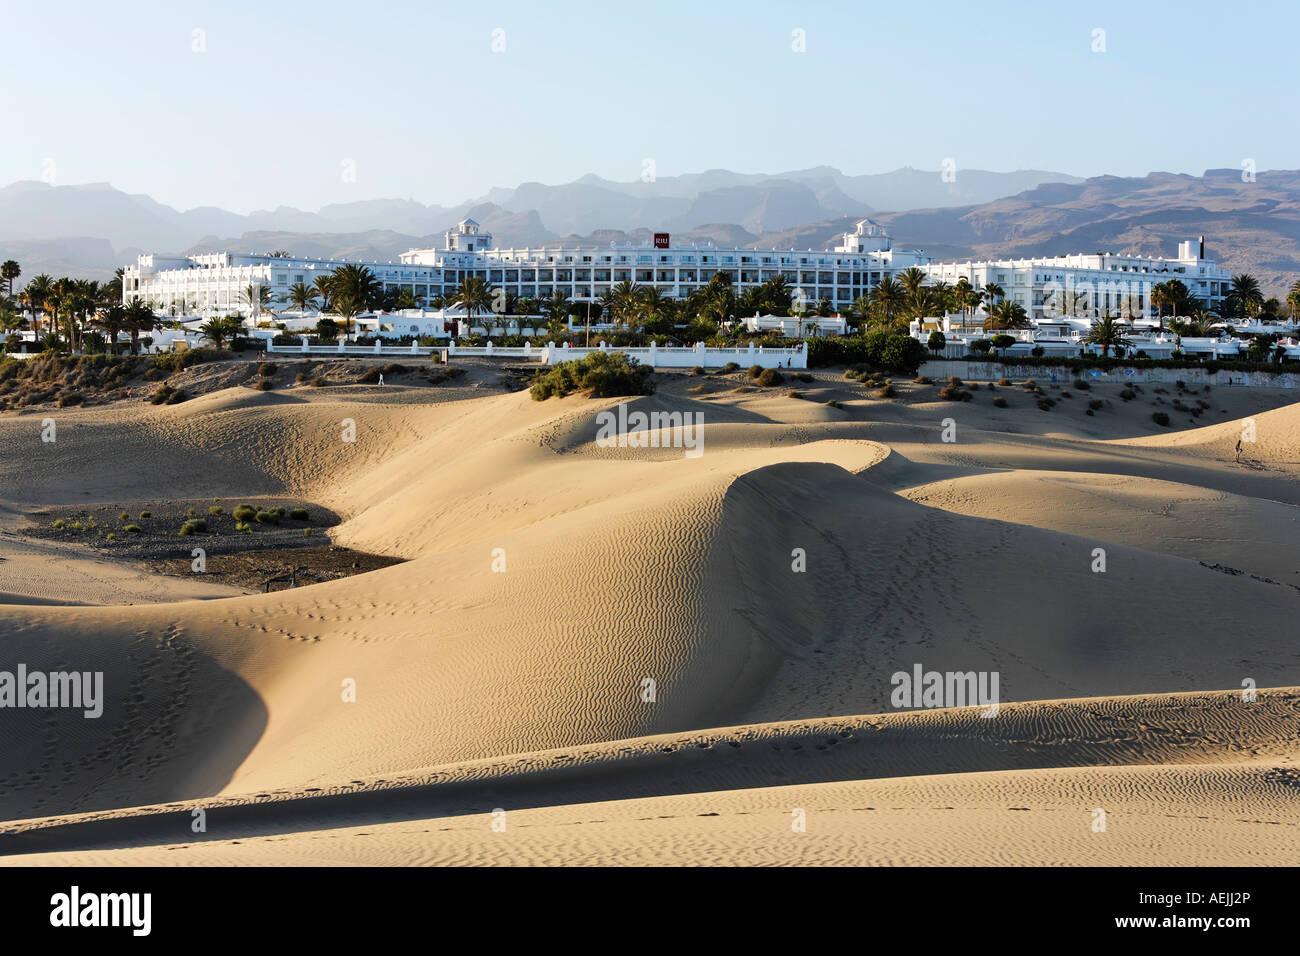 Hotel Riu Palace, Playa del Ingles, Gran Canaria, Spanien Stockbild